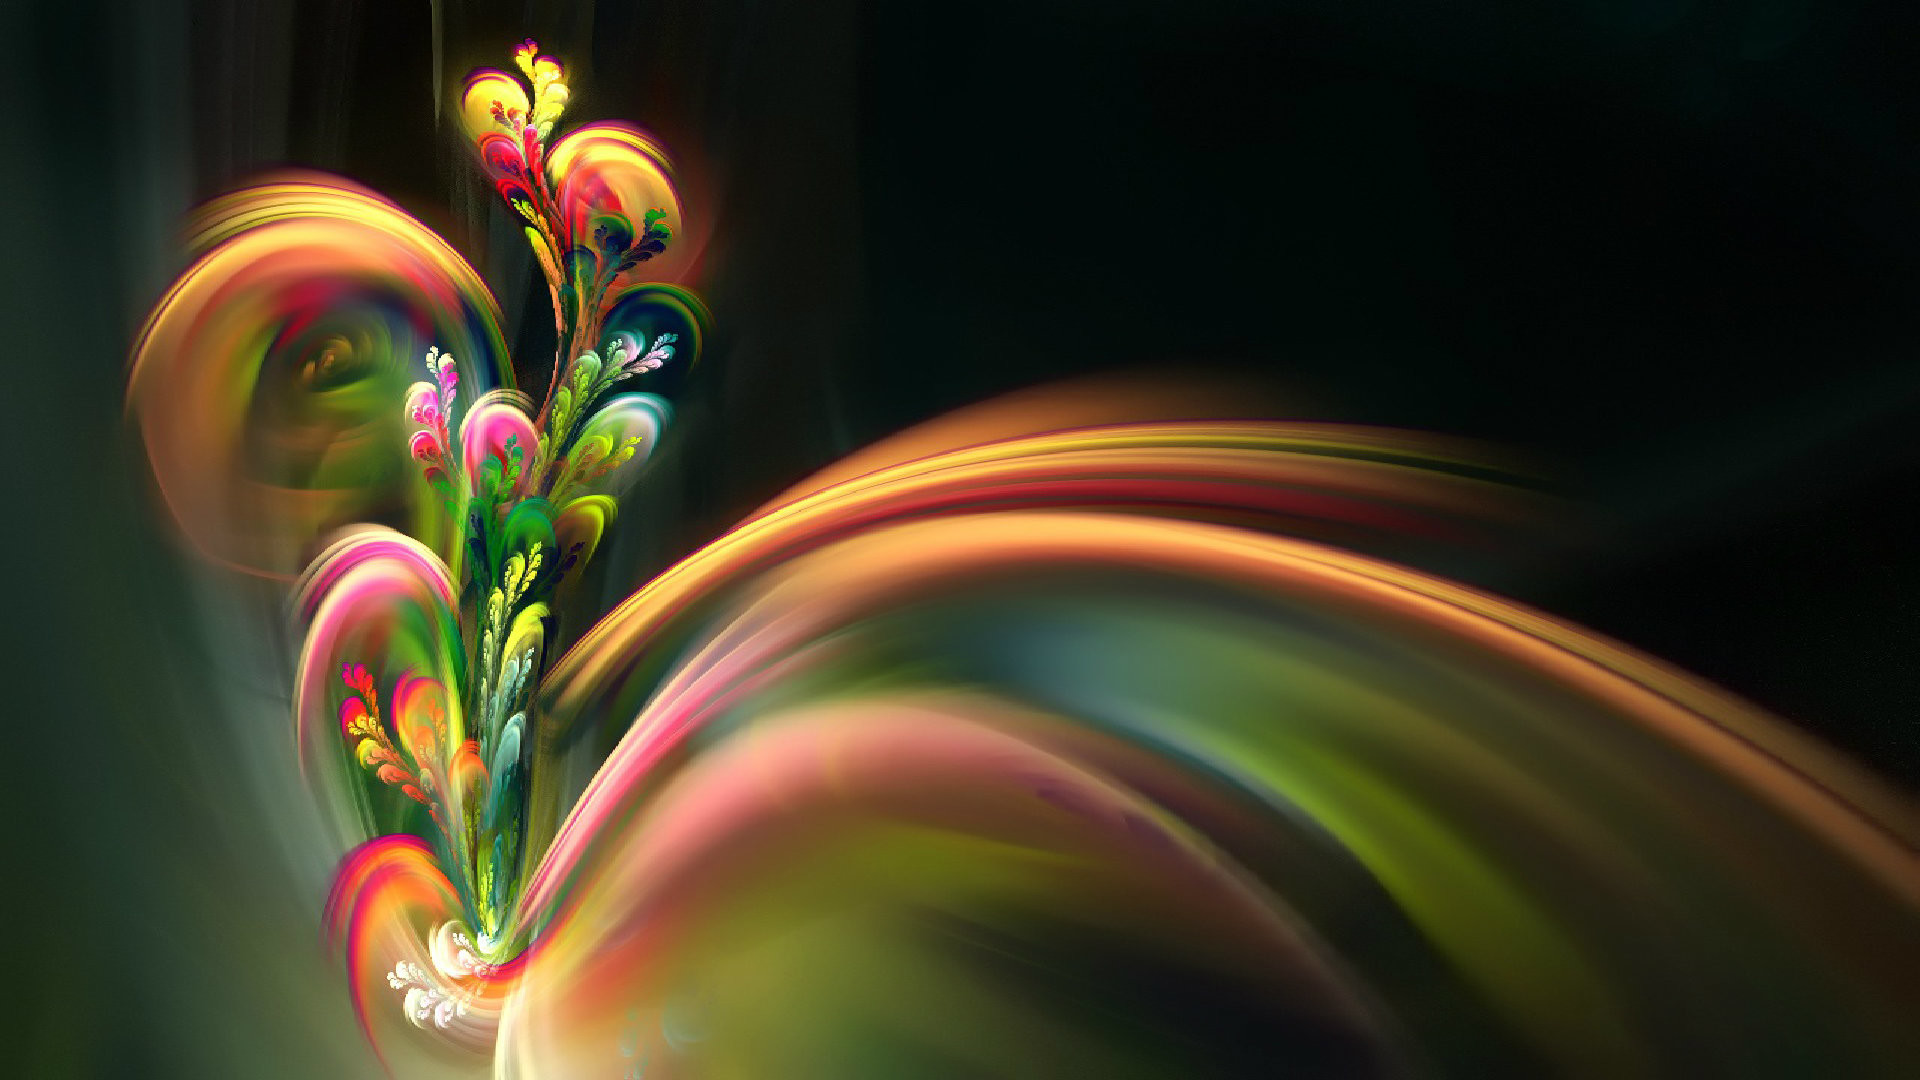 1920x1080 Beautiful Flower Hd Desktop Background Follow9 Com